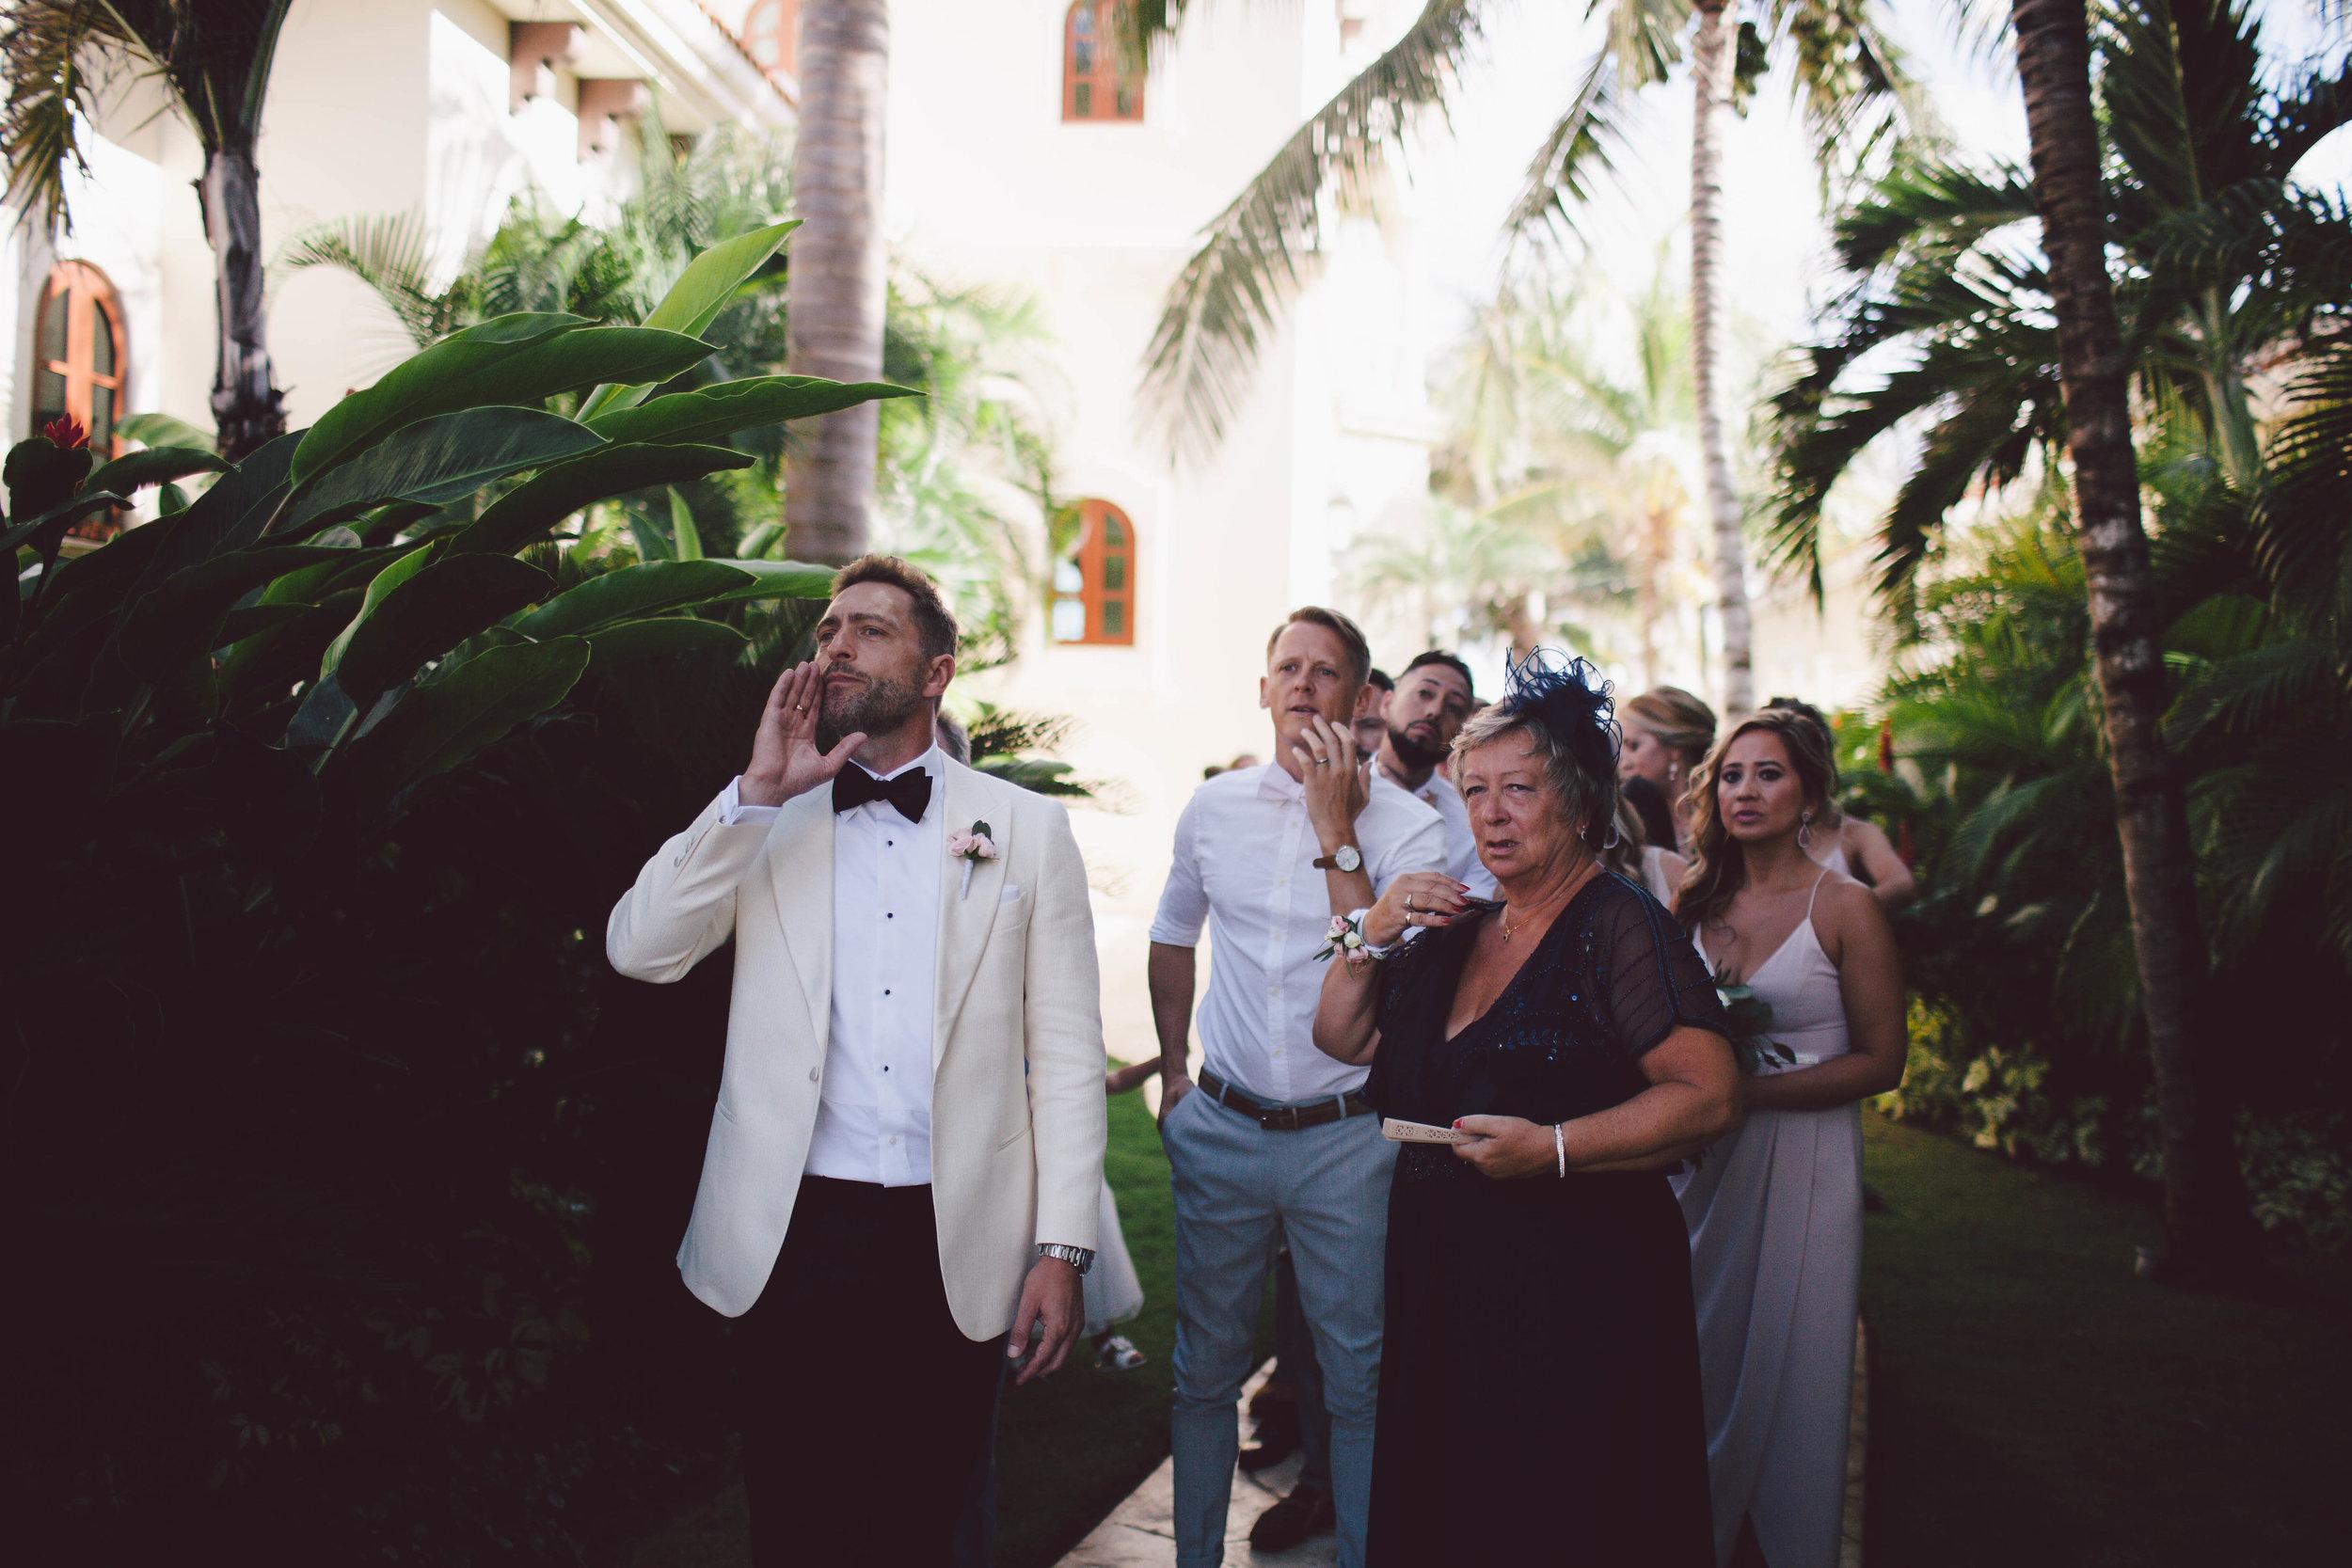 mexico_wedding_cancun_villa_la_joya_evangeline_lane_041.jpg